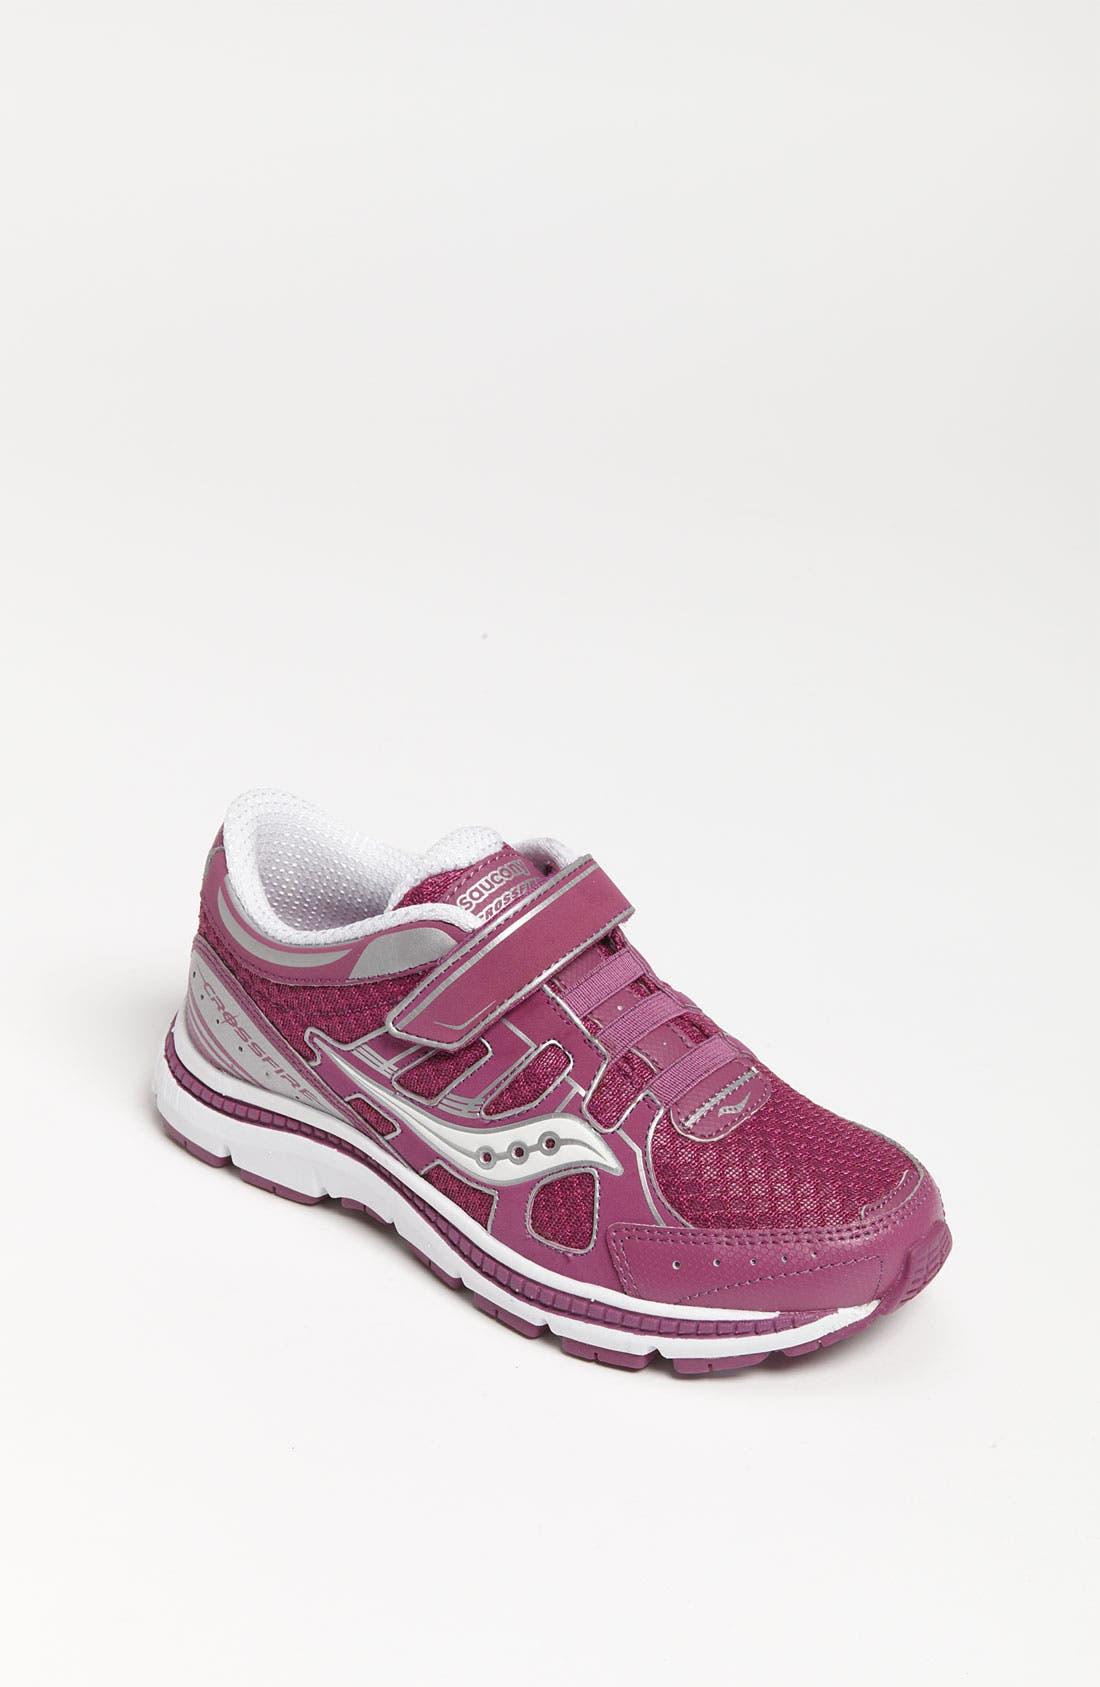 Alternate Image 1 Selected - Saucony 'Crossfire' Sneaker (Toddler, Little Kid & Big Kid)